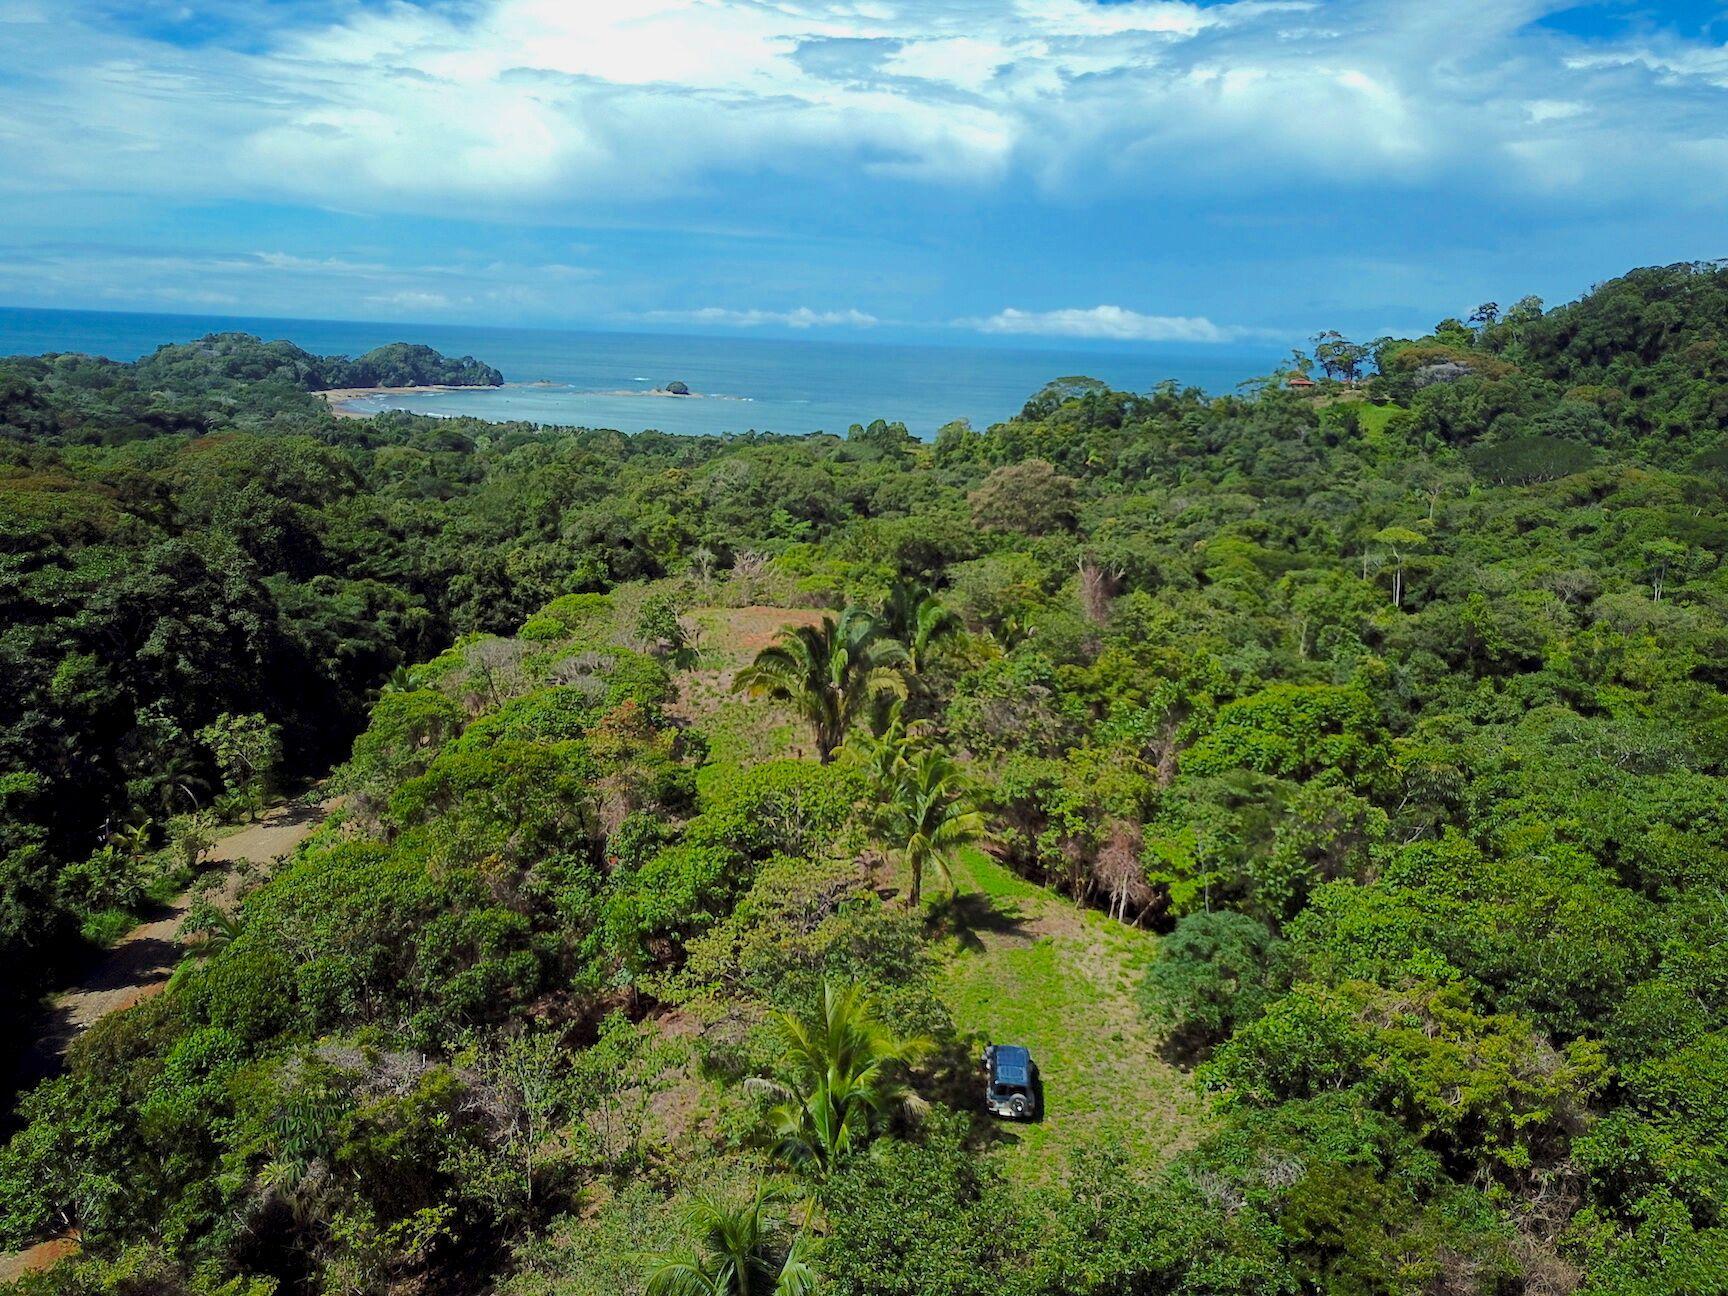 Dominical-Costa-Rica-property-costaricarealestateDOM335-6.jpeg